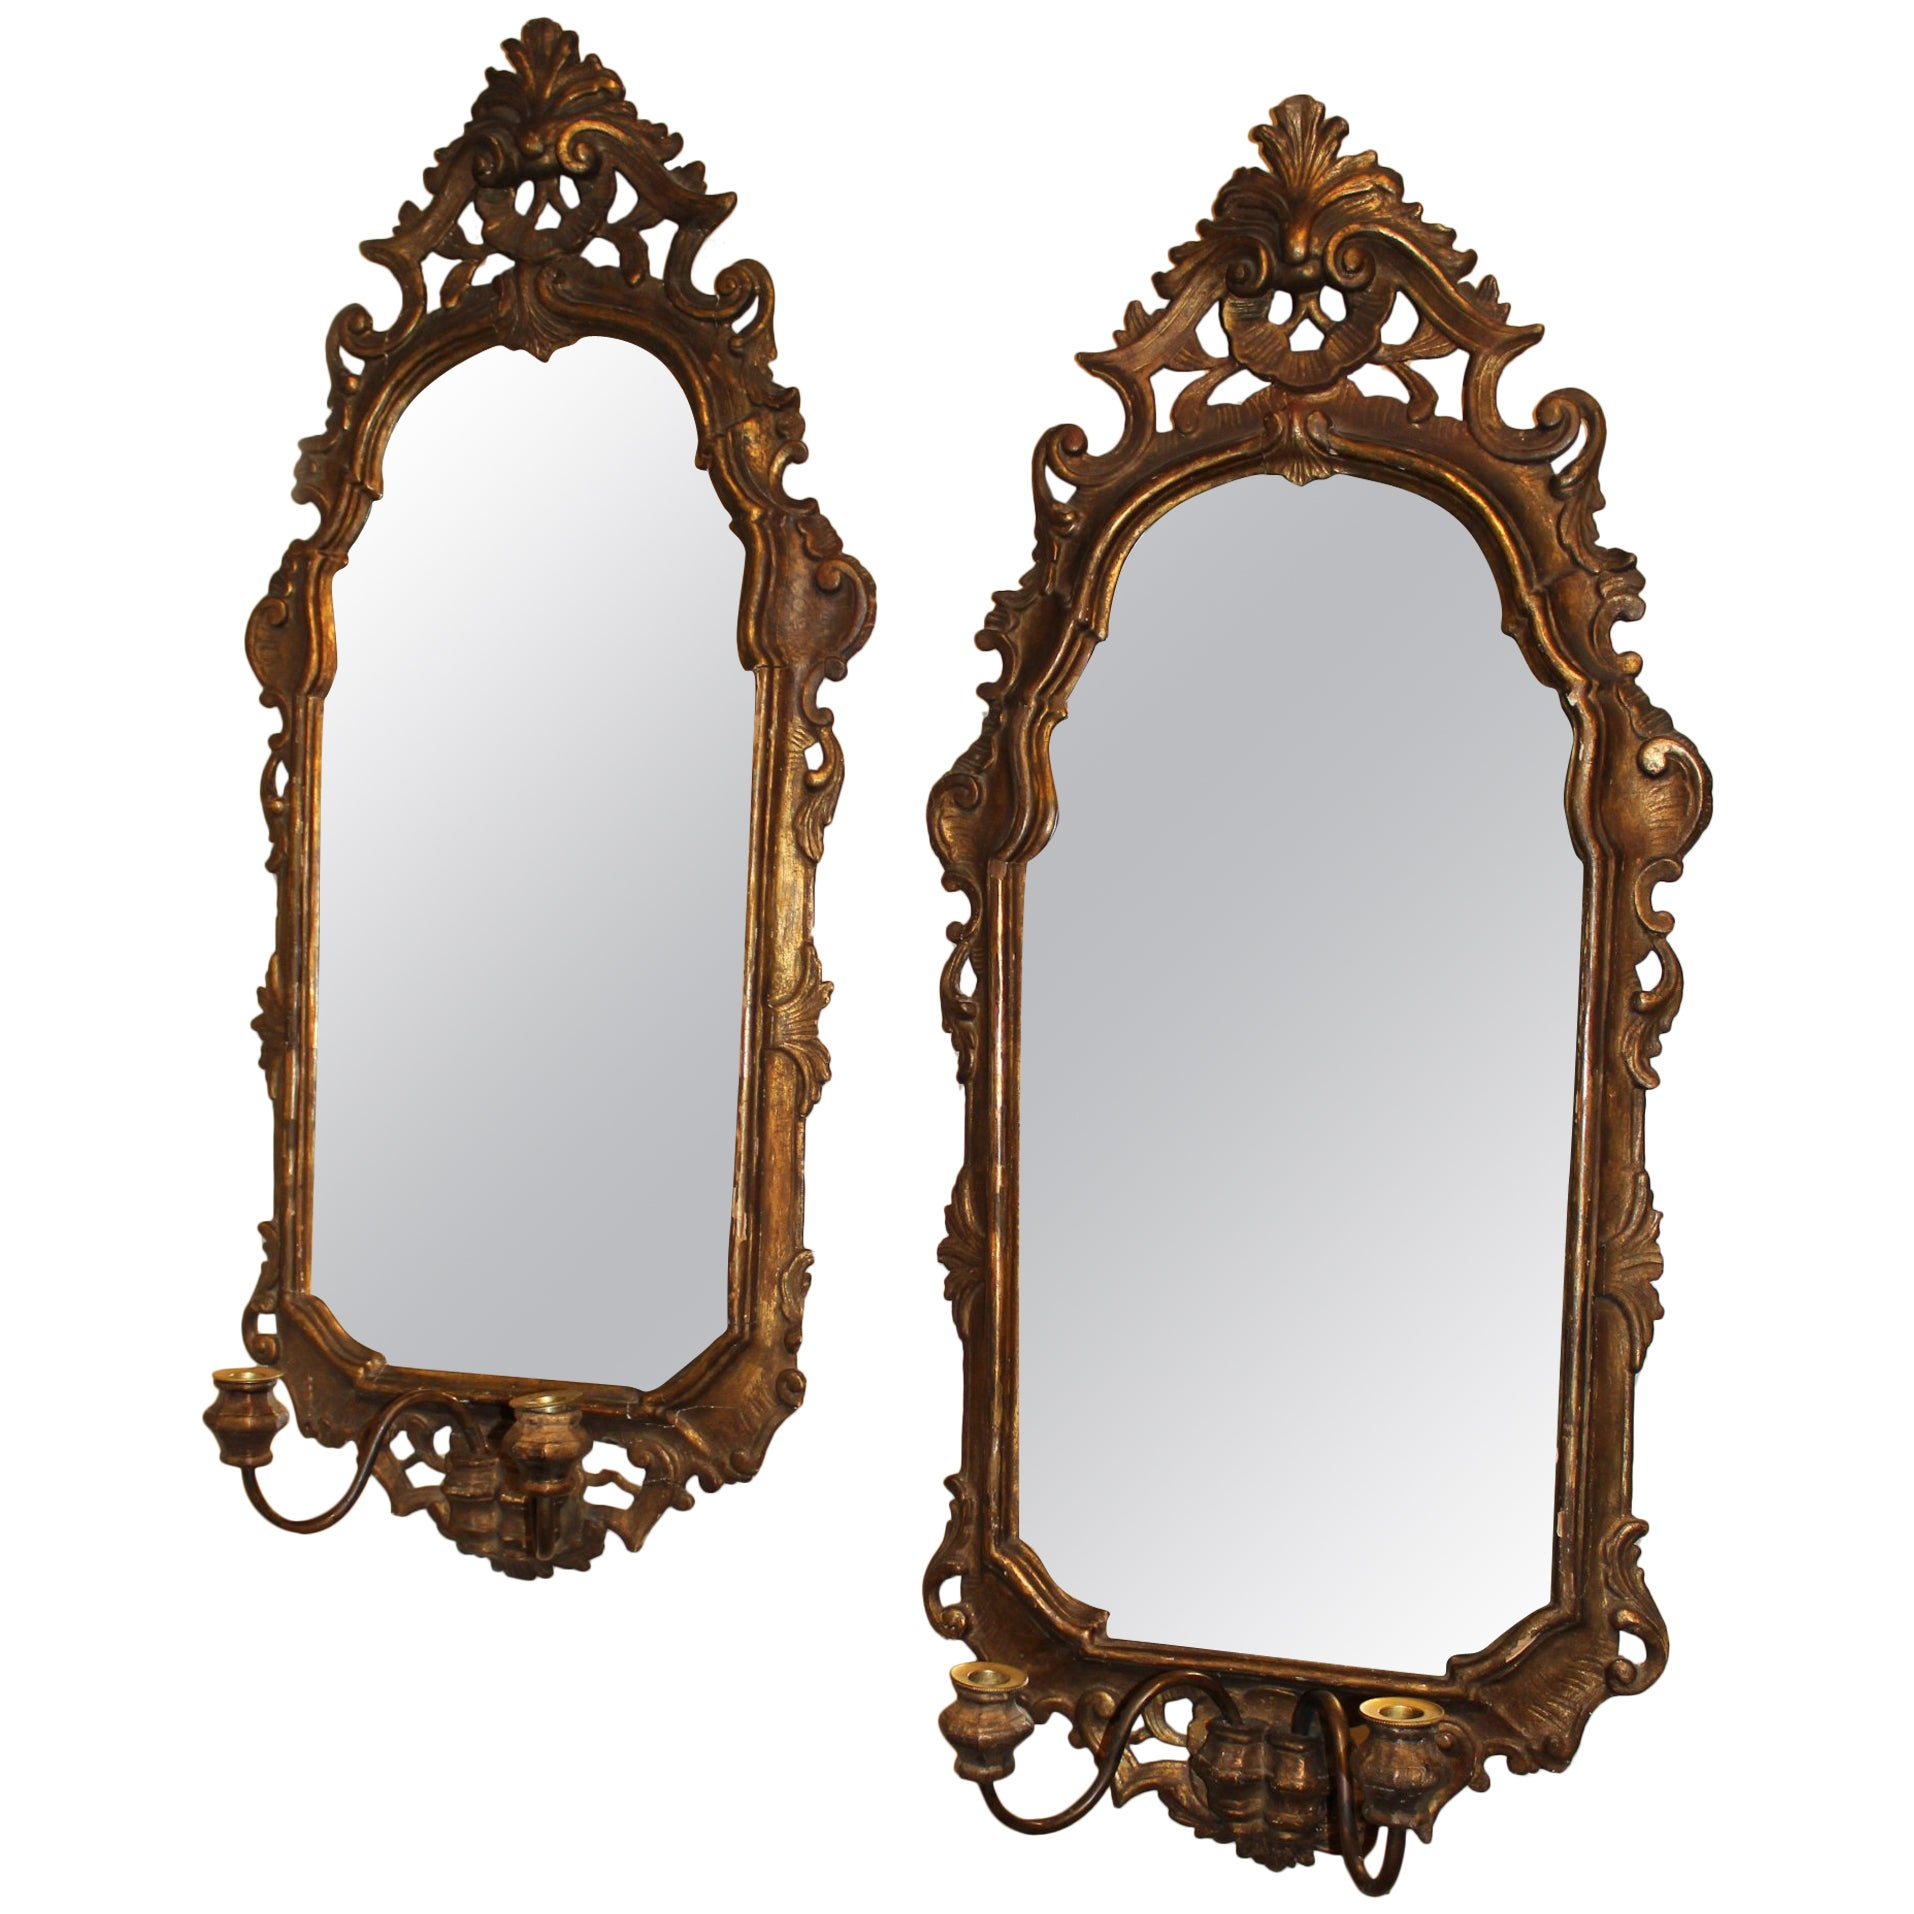 Pair of 19th Century, Italian Rococo Gilt Mirrored Sconces